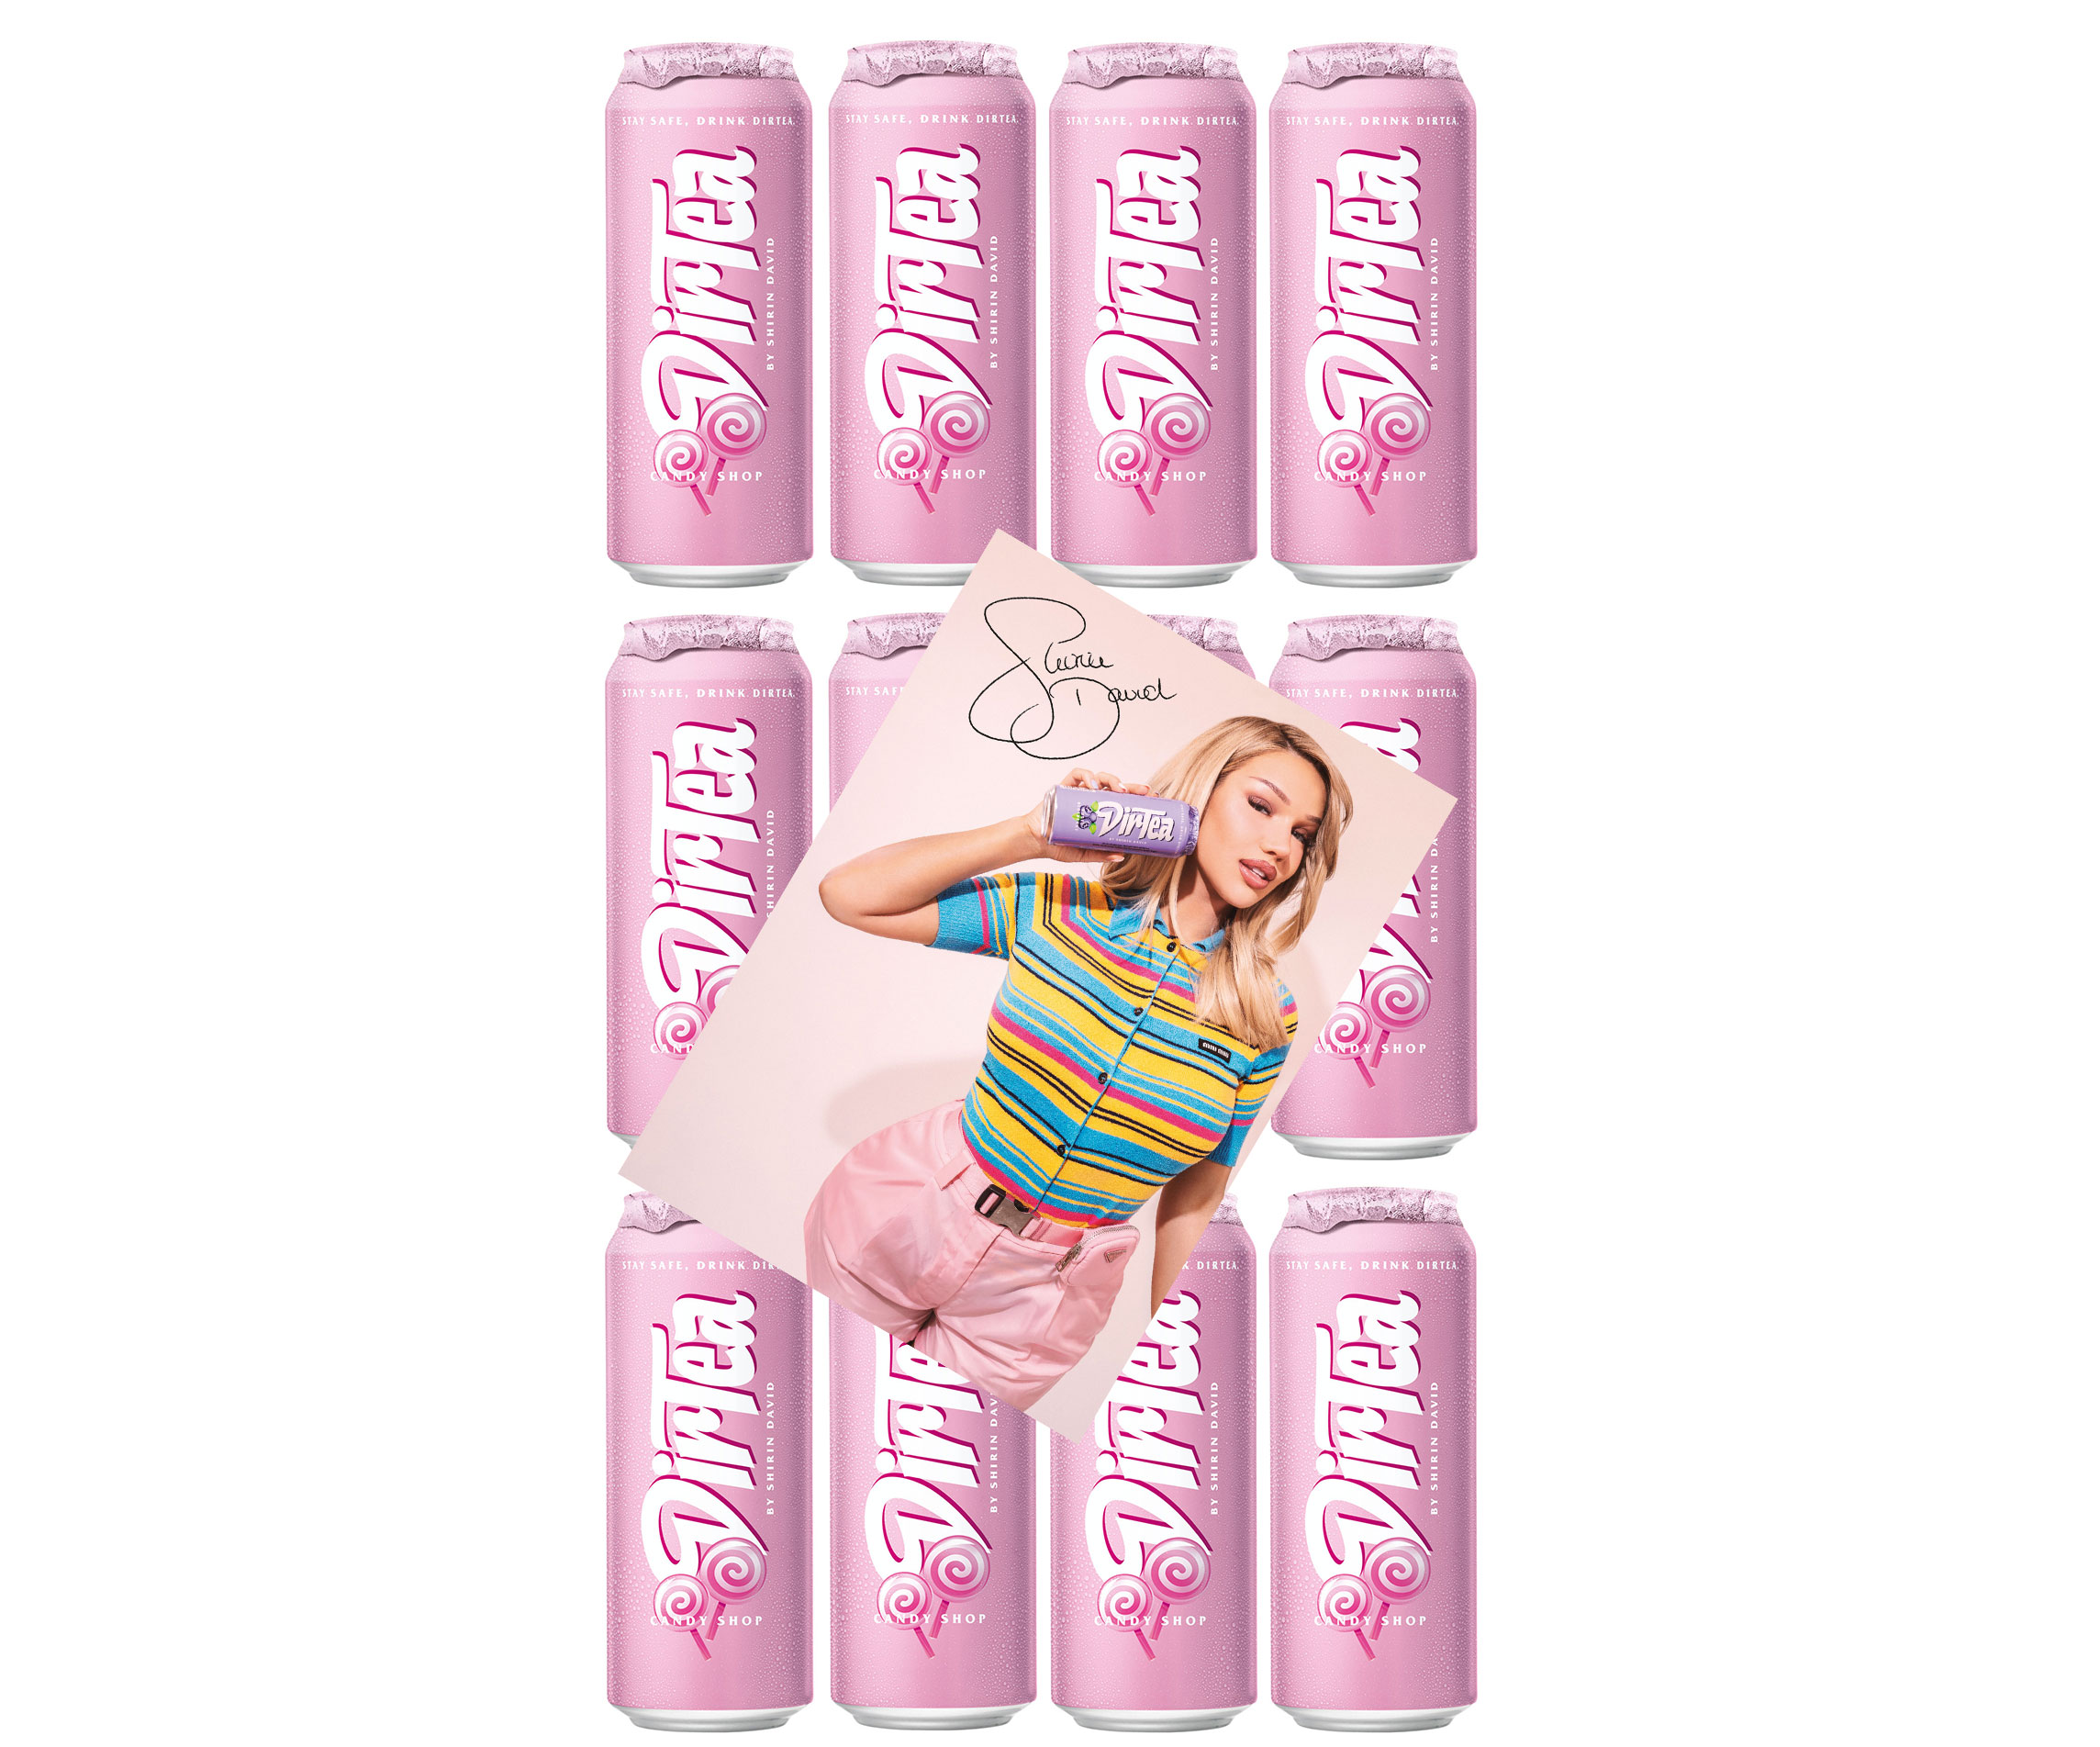 Shirin David's DirTea Candy Shop 12er Set je 500ml + digitalisierte Autogrammkarte DirTea Candy / Zuckerwatte Eistee Icetea Candy Geschmack inkl. Pfand EINWEG